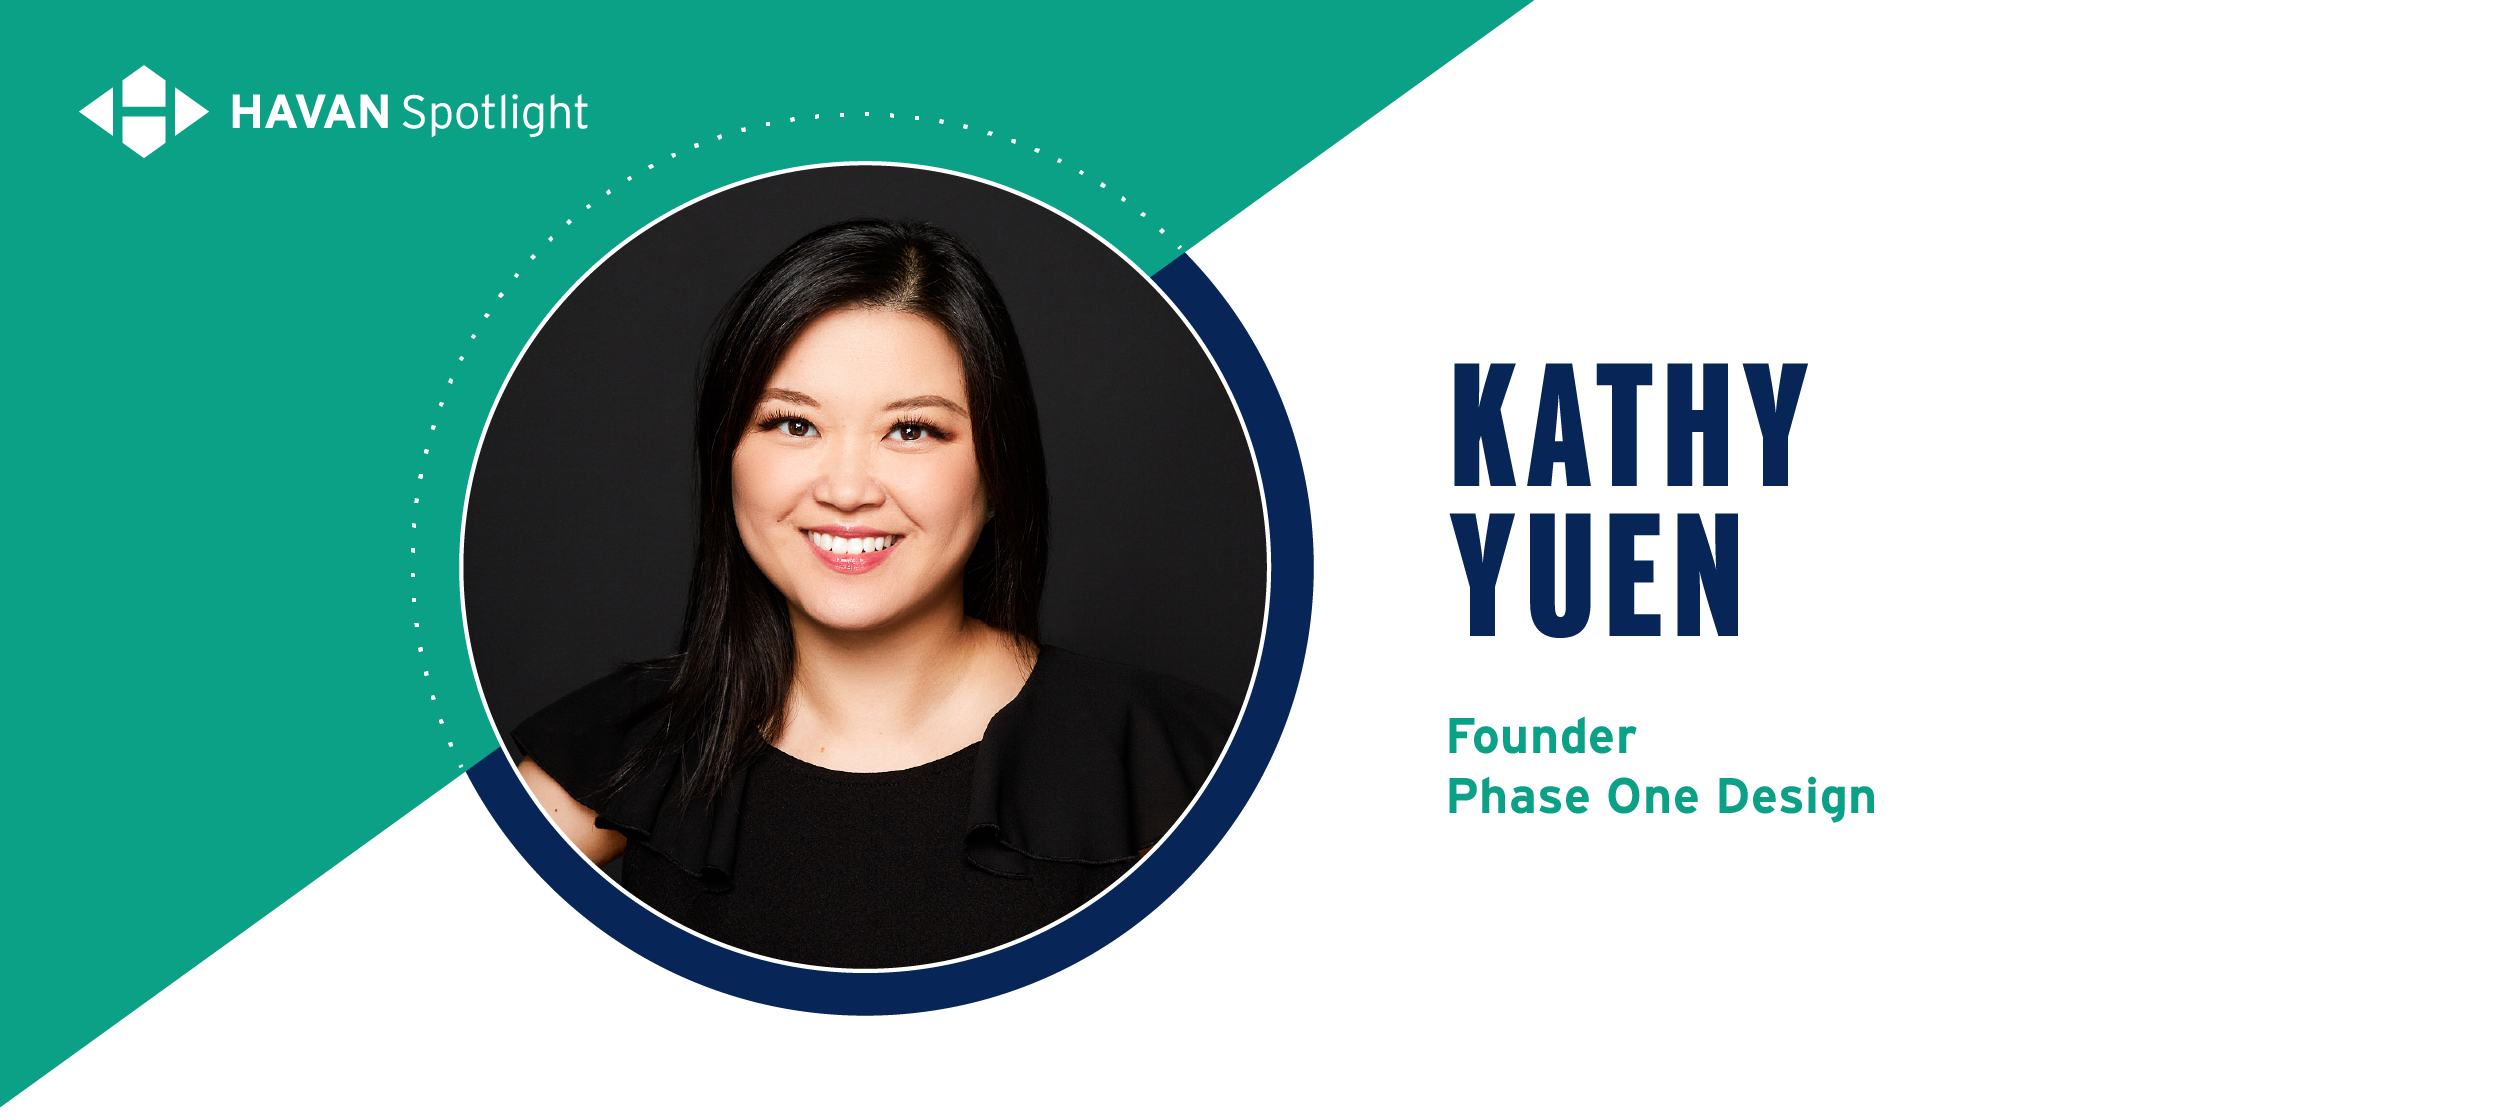 Kathy Yuen Phase One Design